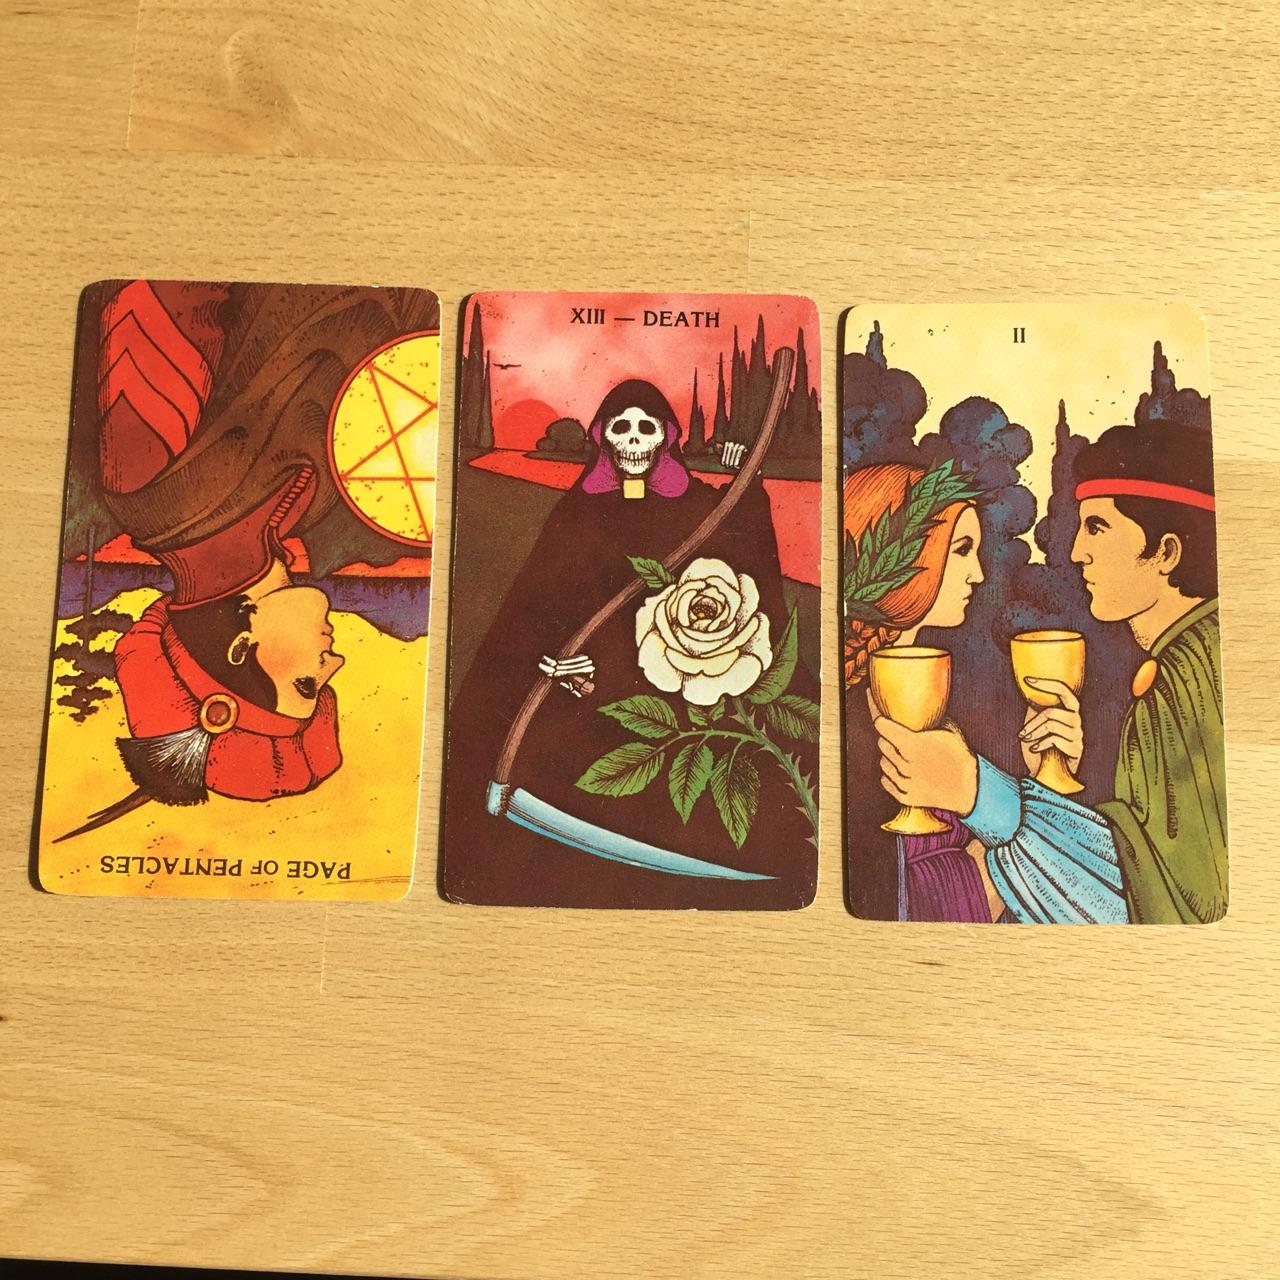 simons-tarot-cards.jpg